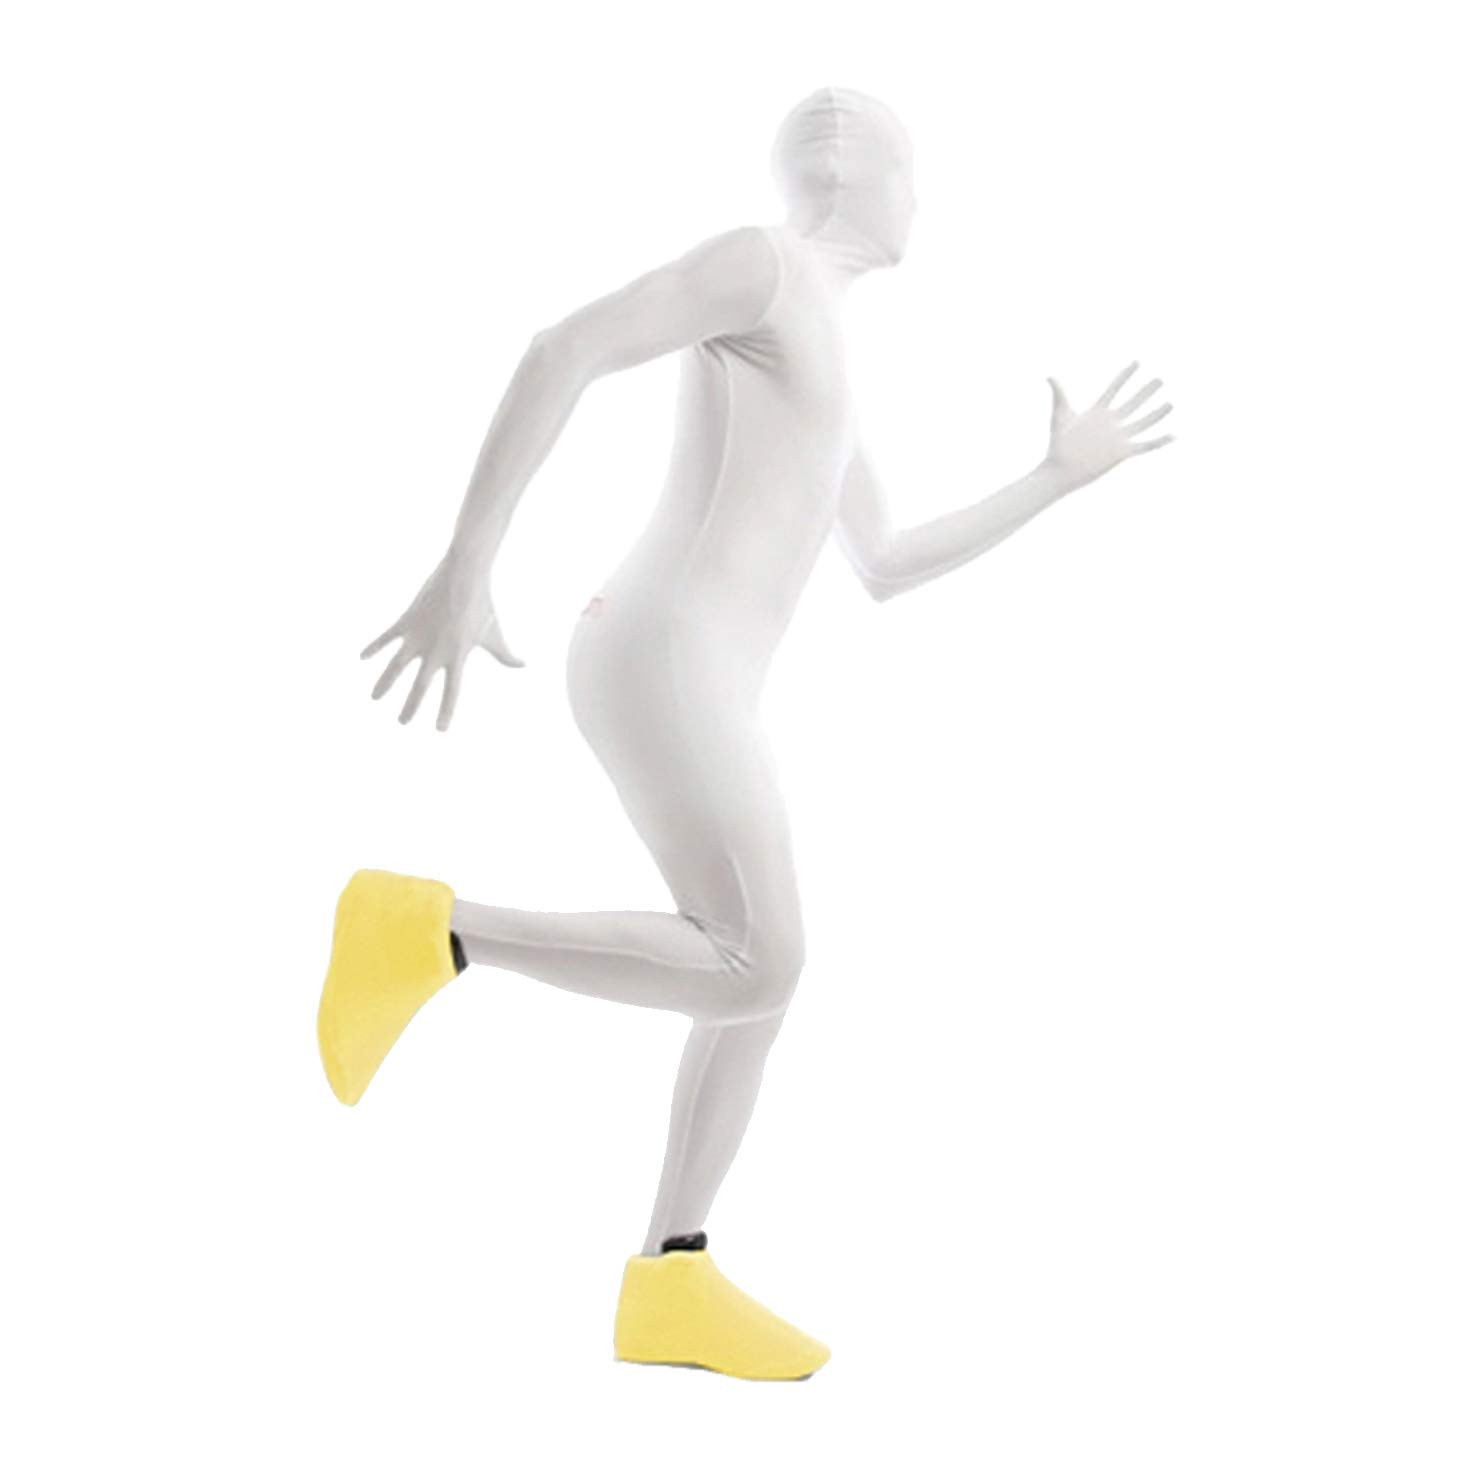 Morphsuits 鞋套 均码 彩色服装配饰鞋 均码 黄色